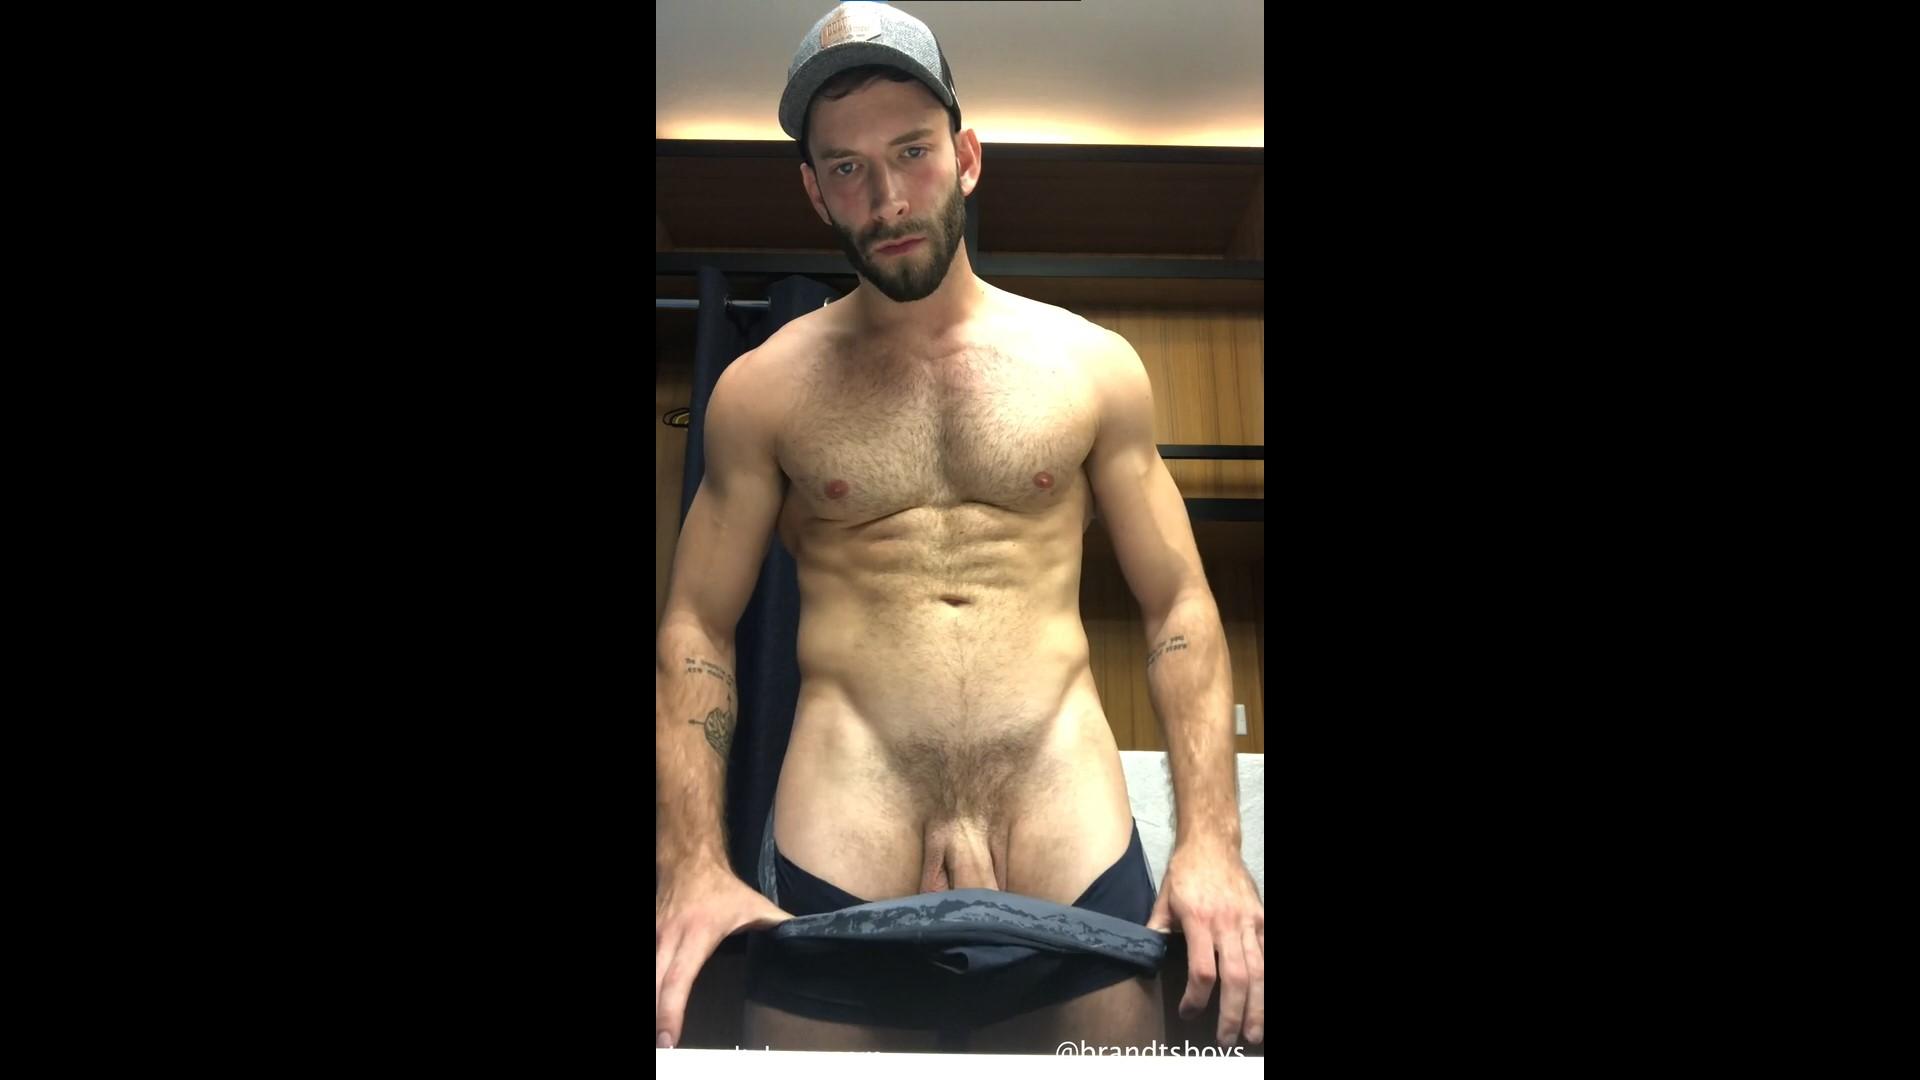 Jerking off and cumming over my underwear after gym – KylexBrandt – Gay for Fans – gayforfans.com